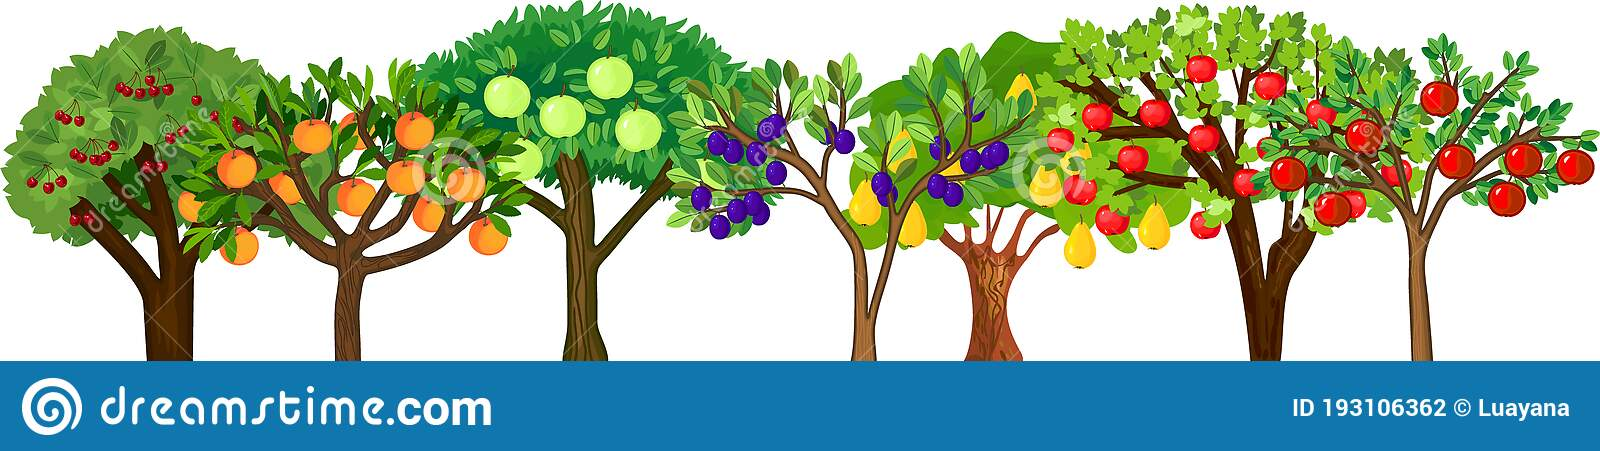 trunk-clipart-apple-tree-17.jpg 1,115×1,300 pixels   Tree drawing simple,  Apple tree drawing, Blossom tree tattoo